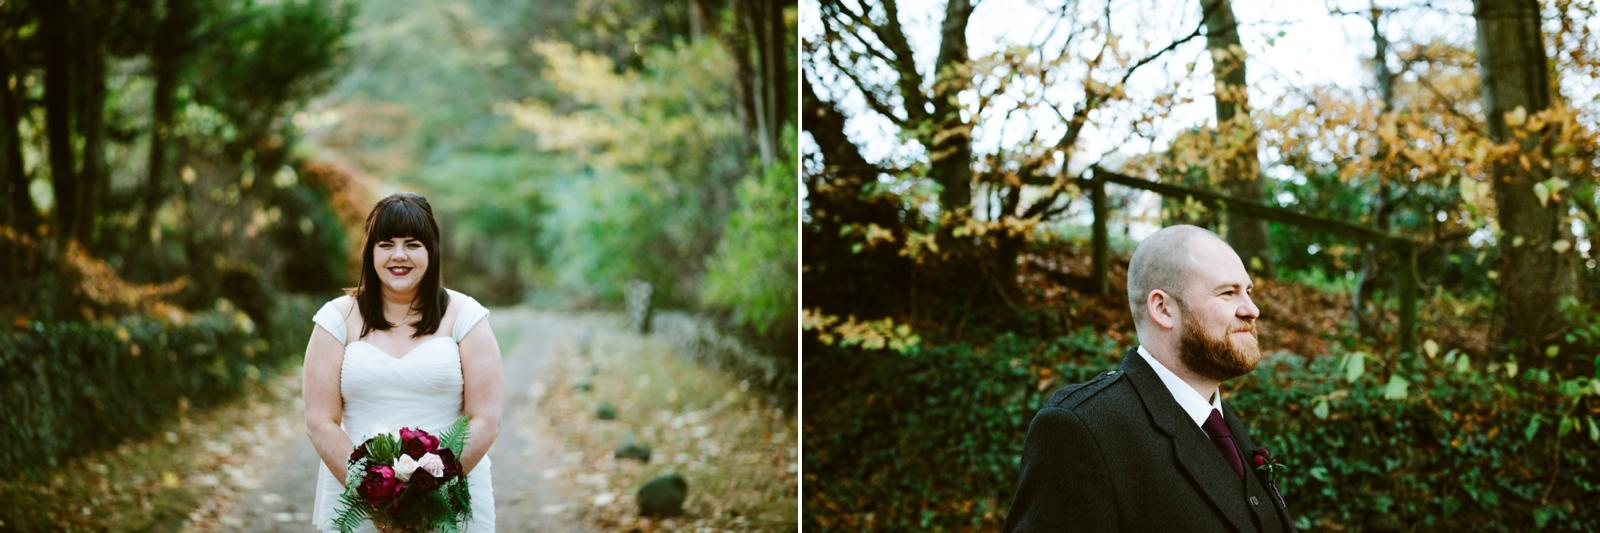 alternative-wedding-photography-scotland-katie-stephen-aikwood-tower-307.jpg